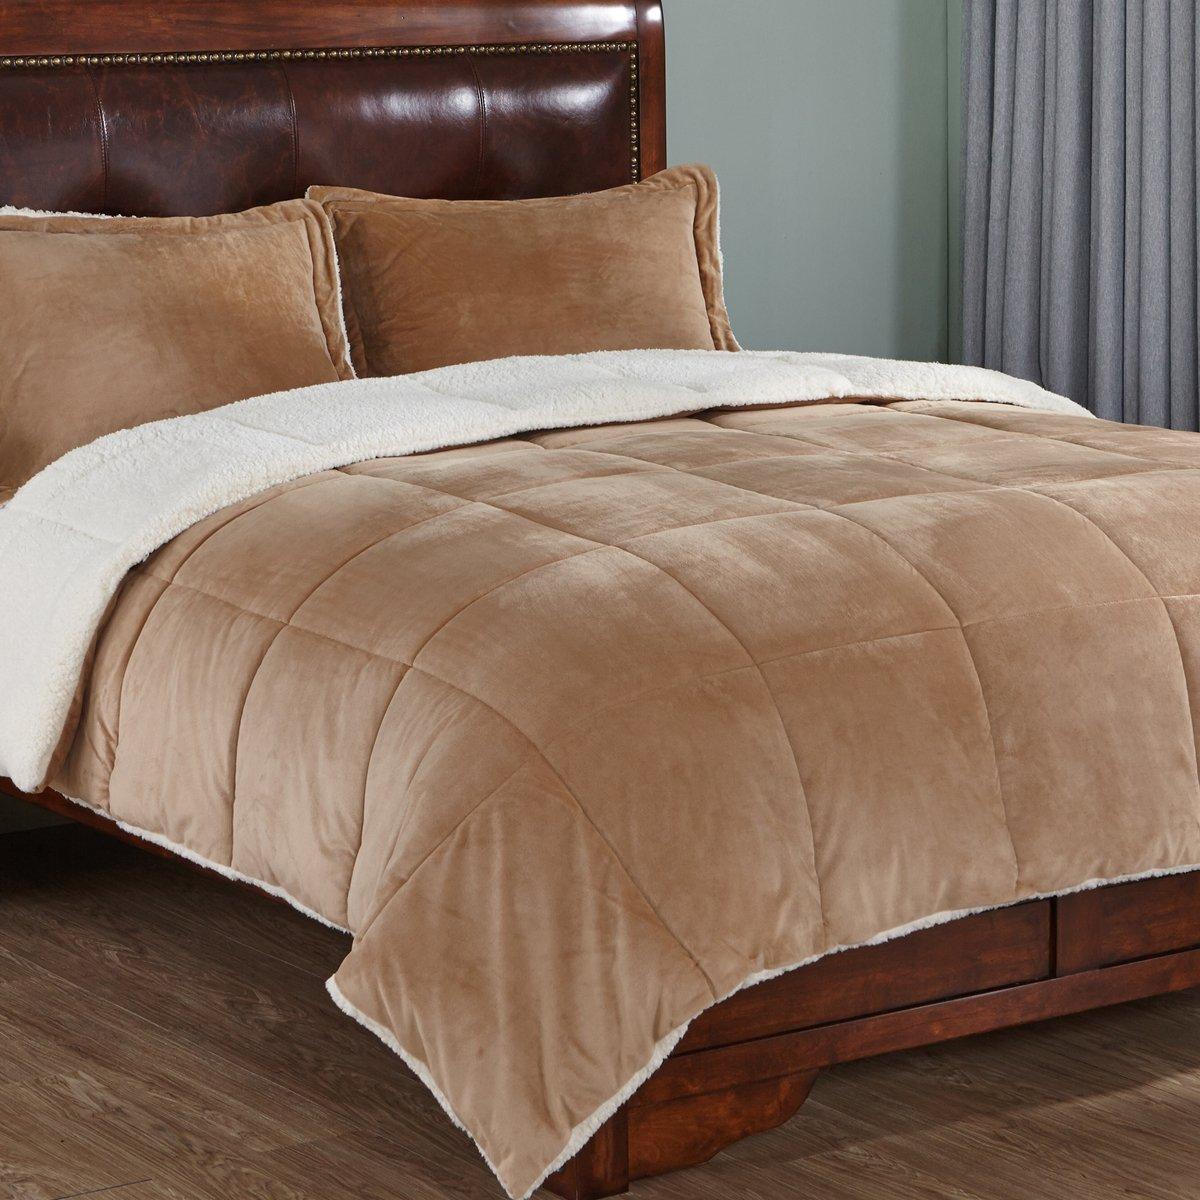 Amazon.com: 15-Piece Sherpa Reversible Down Alternative Comforter ...